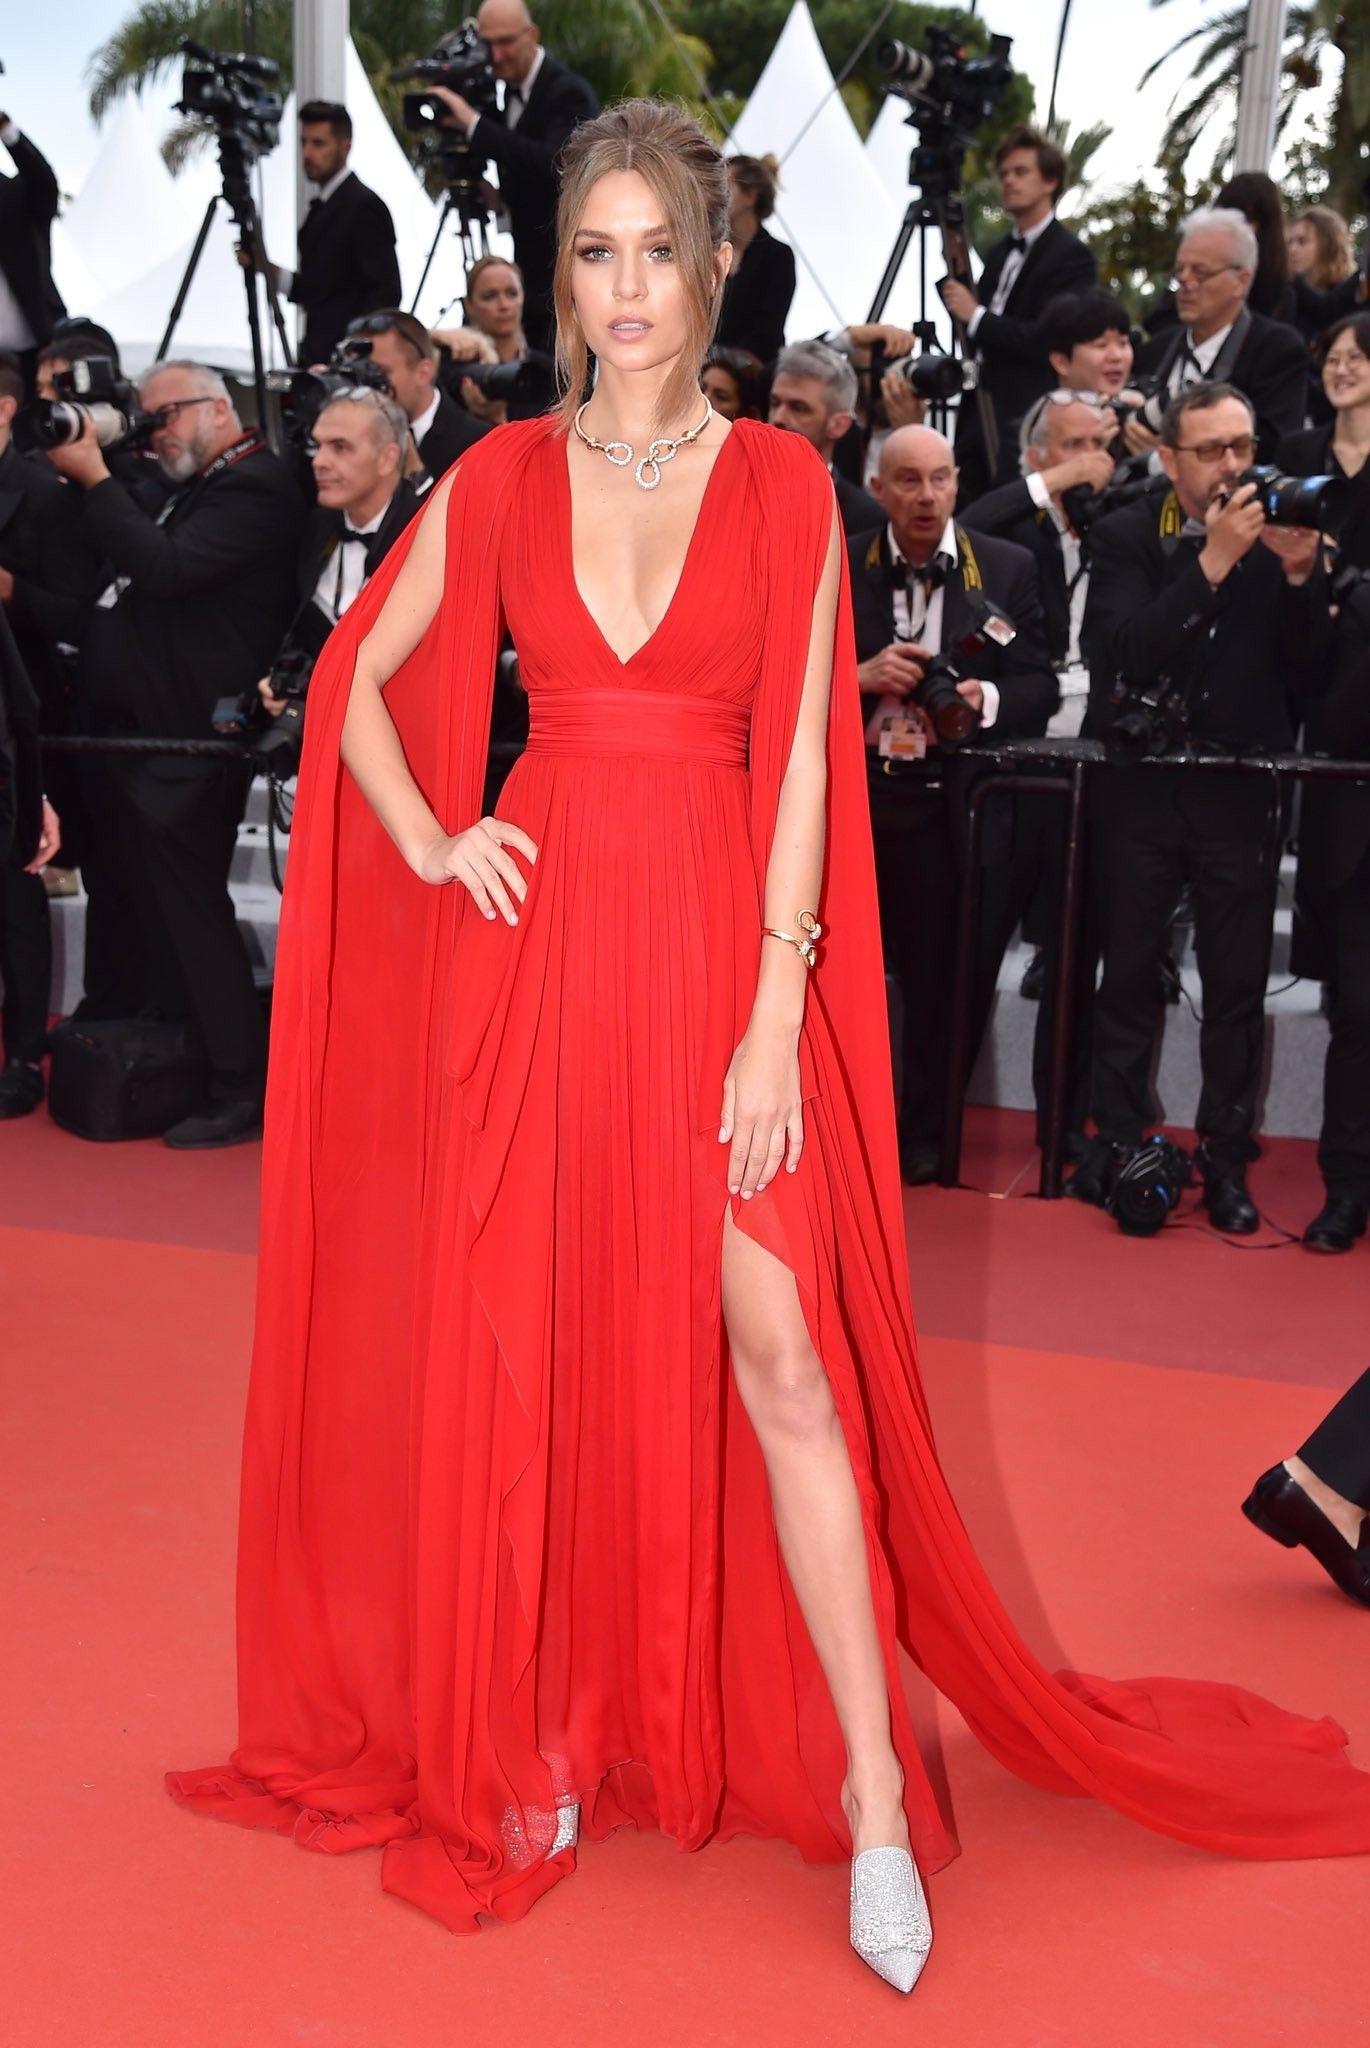 Josephine Skriver Cannes 2019 in 2020 Red carpet dresses